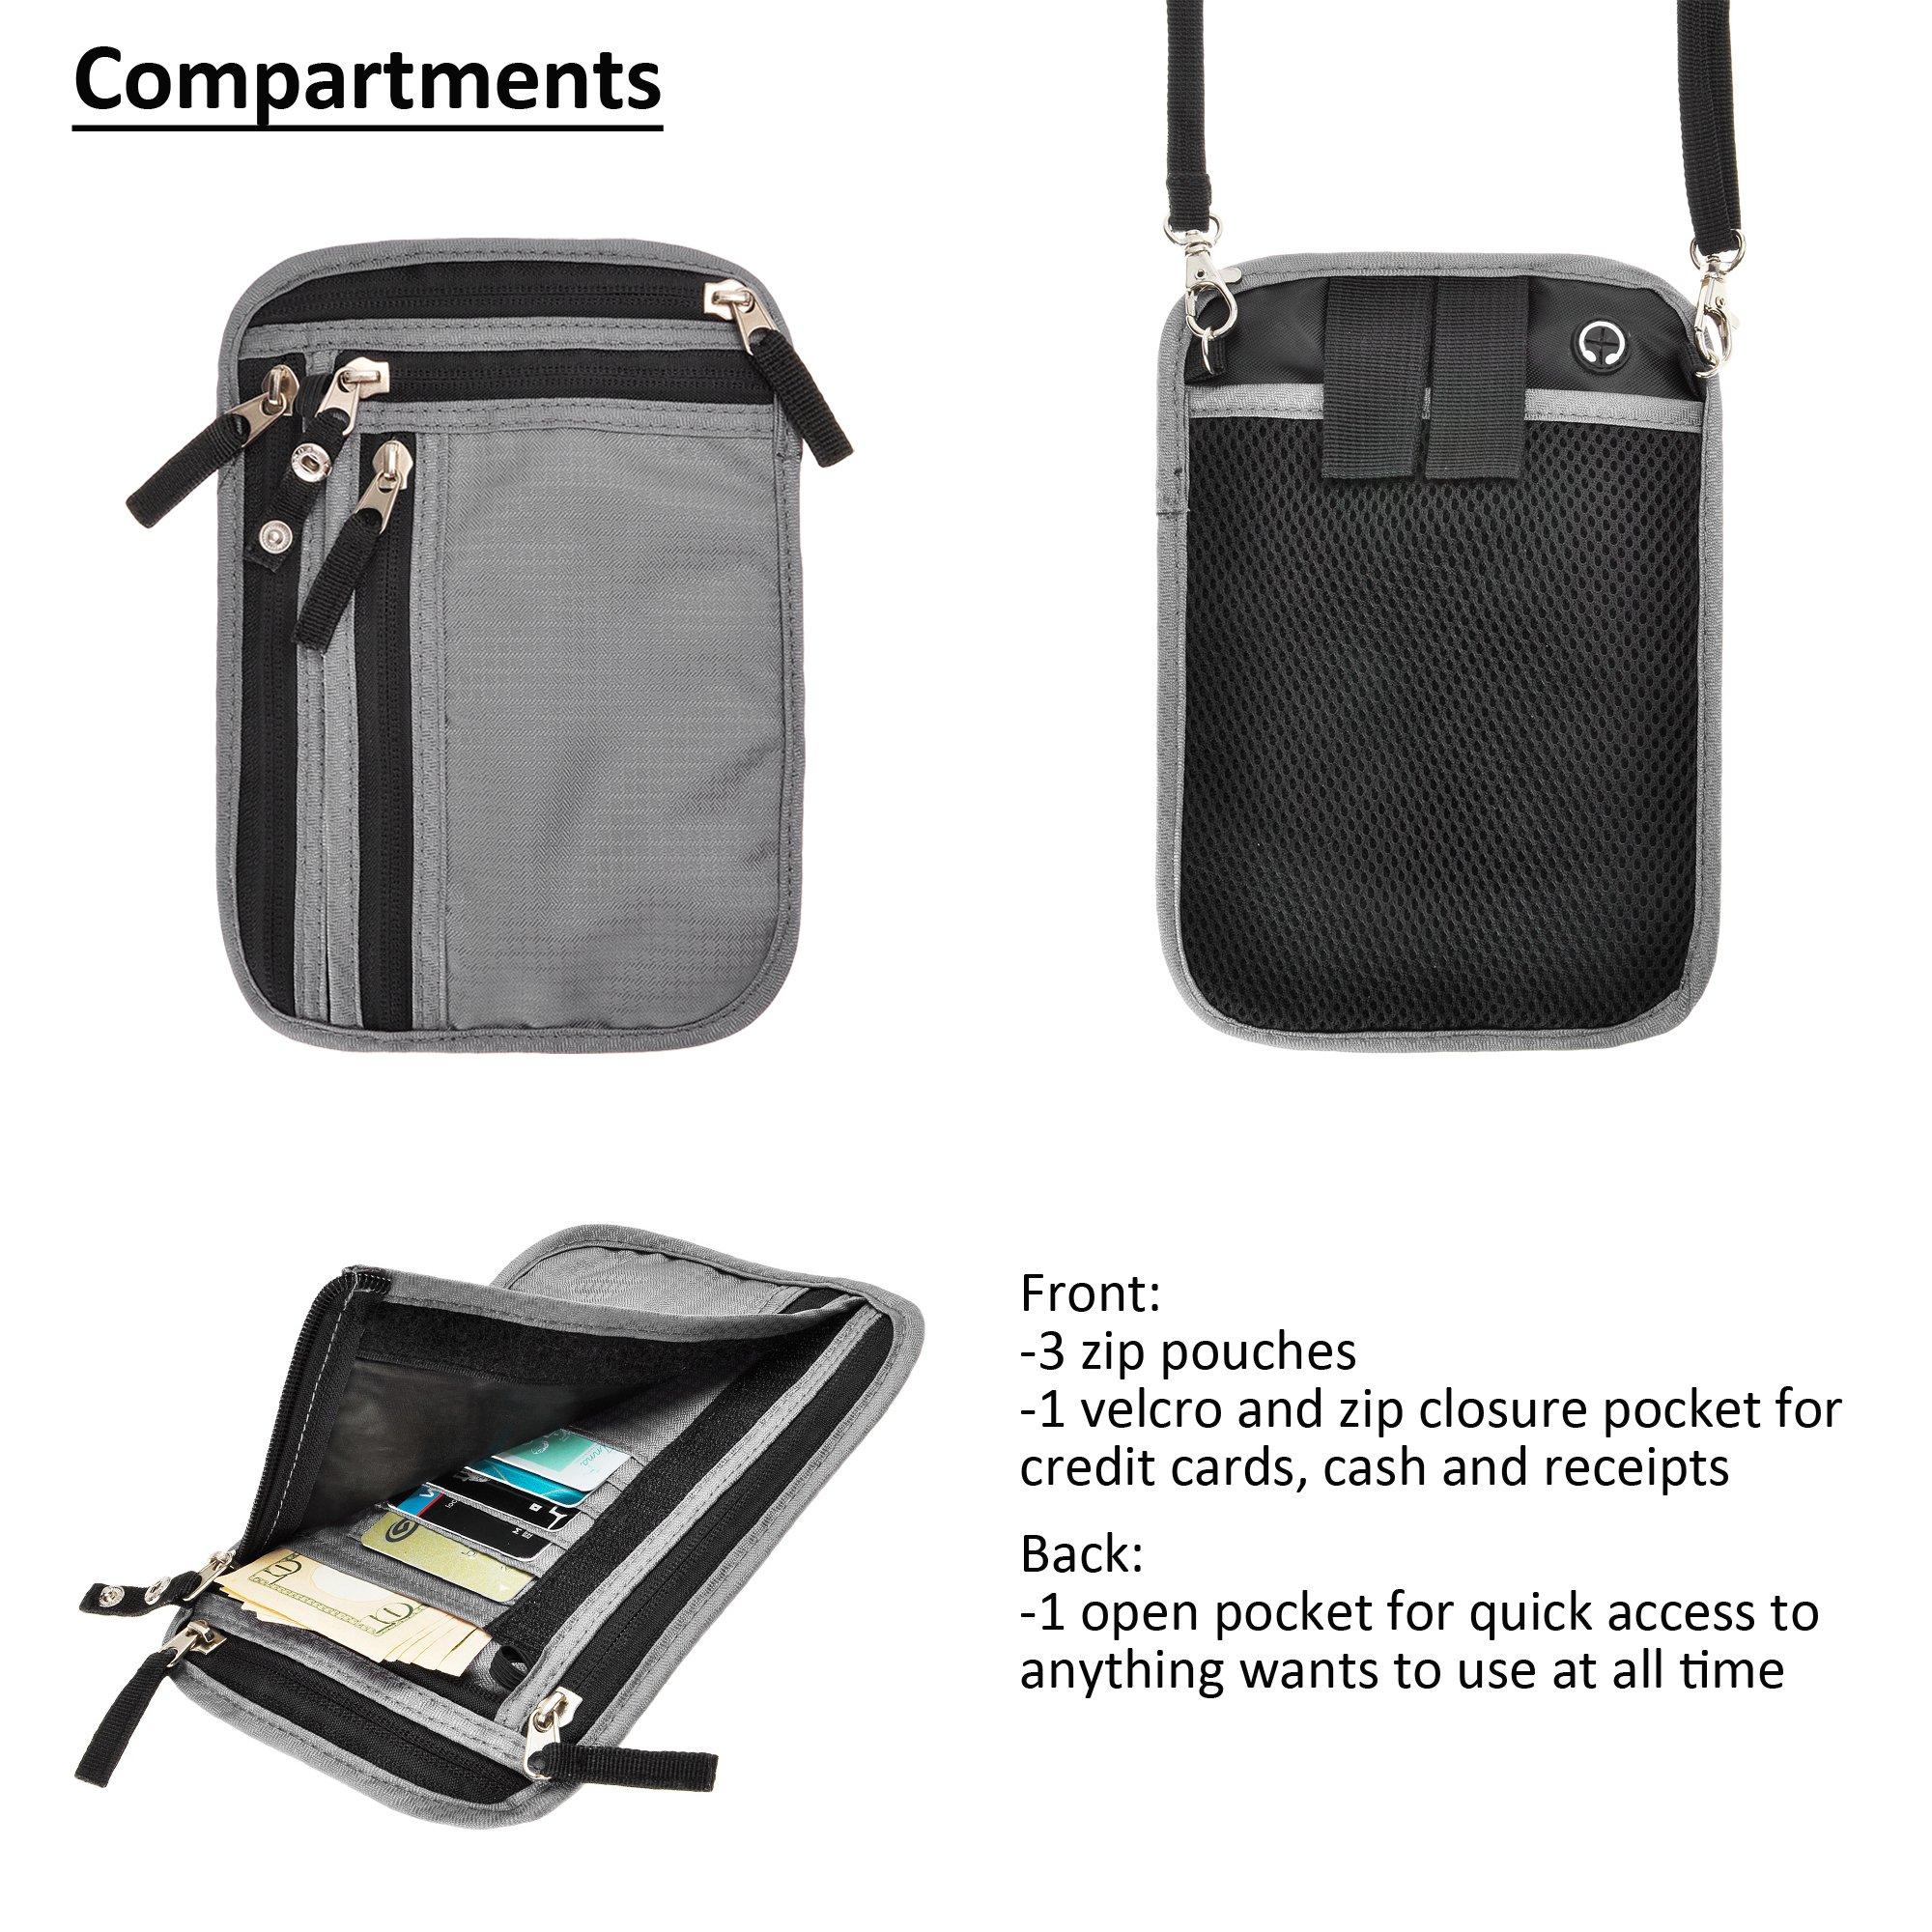 RFID Blocking 2-in-1 Travel Neck Stash and Belt Wallet Security Hidden Passport Holder Pouch by ZLYC (Image #4)